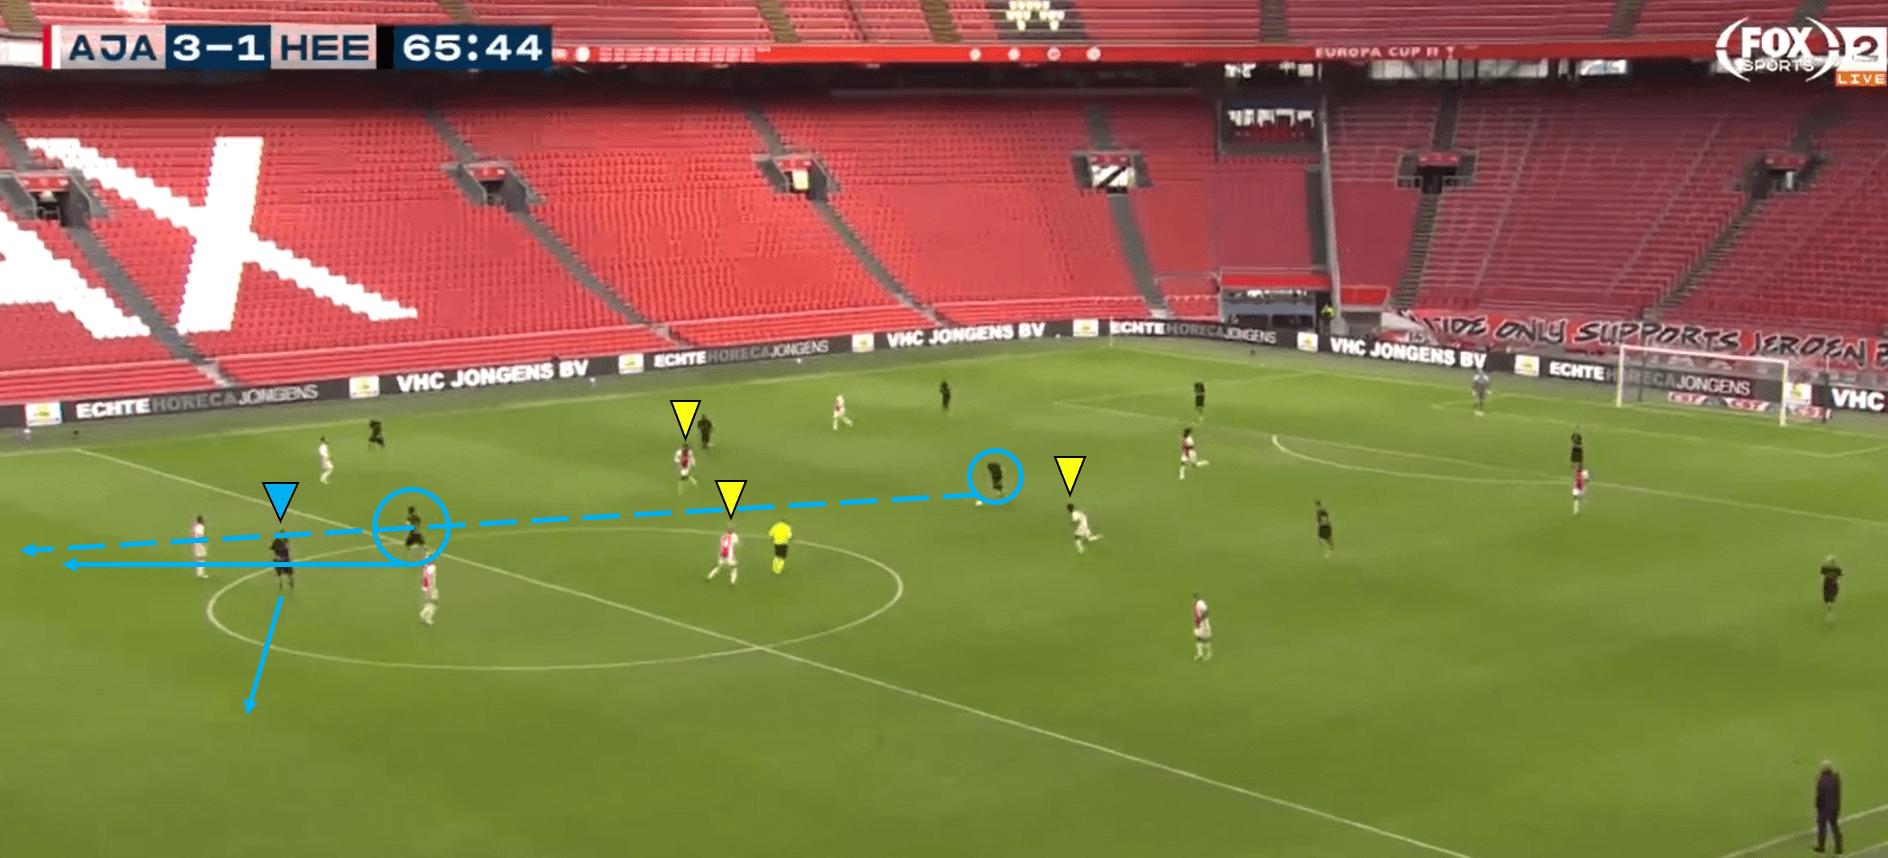 Champions League 2020/21: Atalanta vs Ajax – Tactical Preview analysis tactics